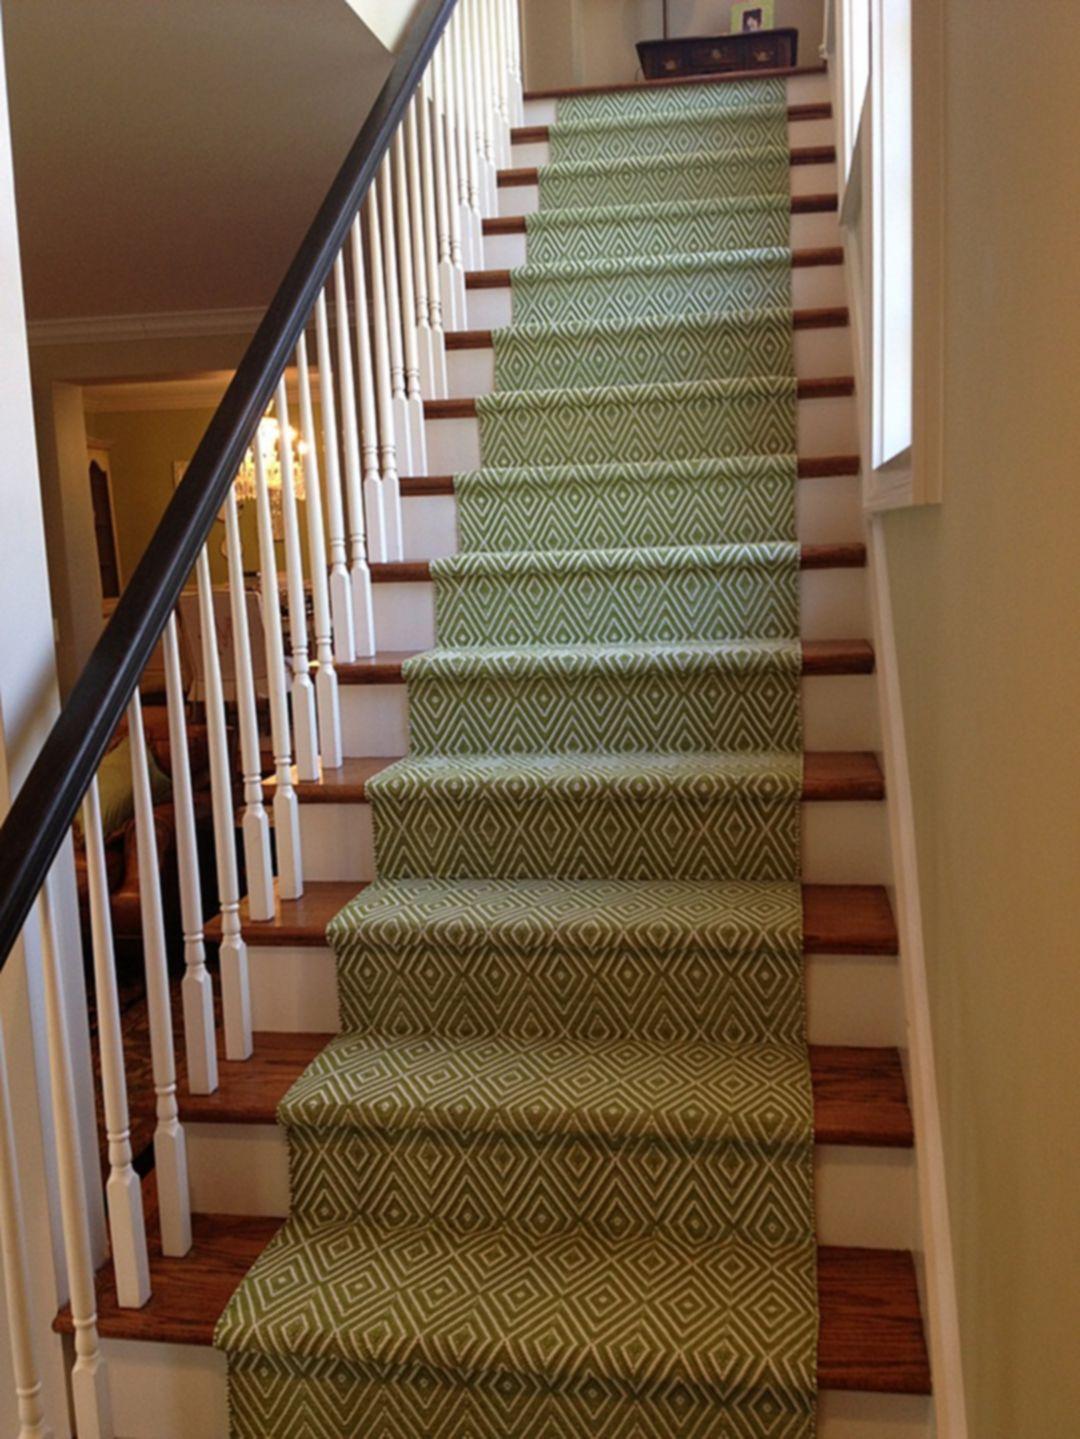 25+ Best Inspiration for Carpet Stair Decoration Ideas